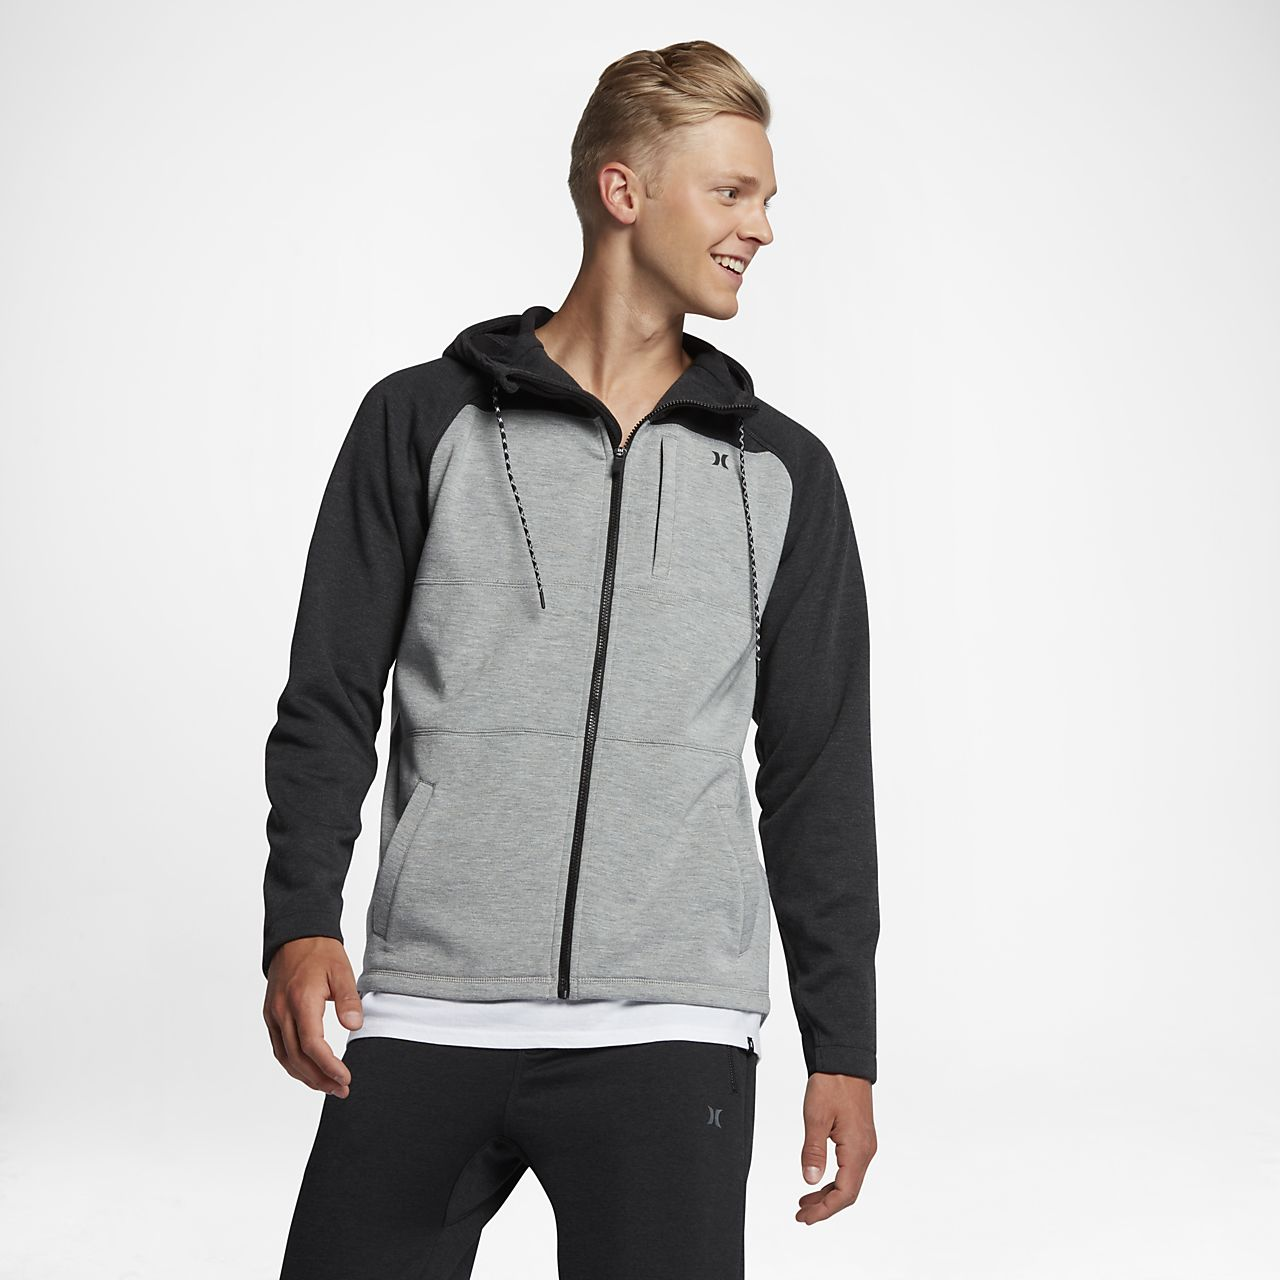 Hurley Therma Protect Plus Zip Sudadera con capucha - Hombre